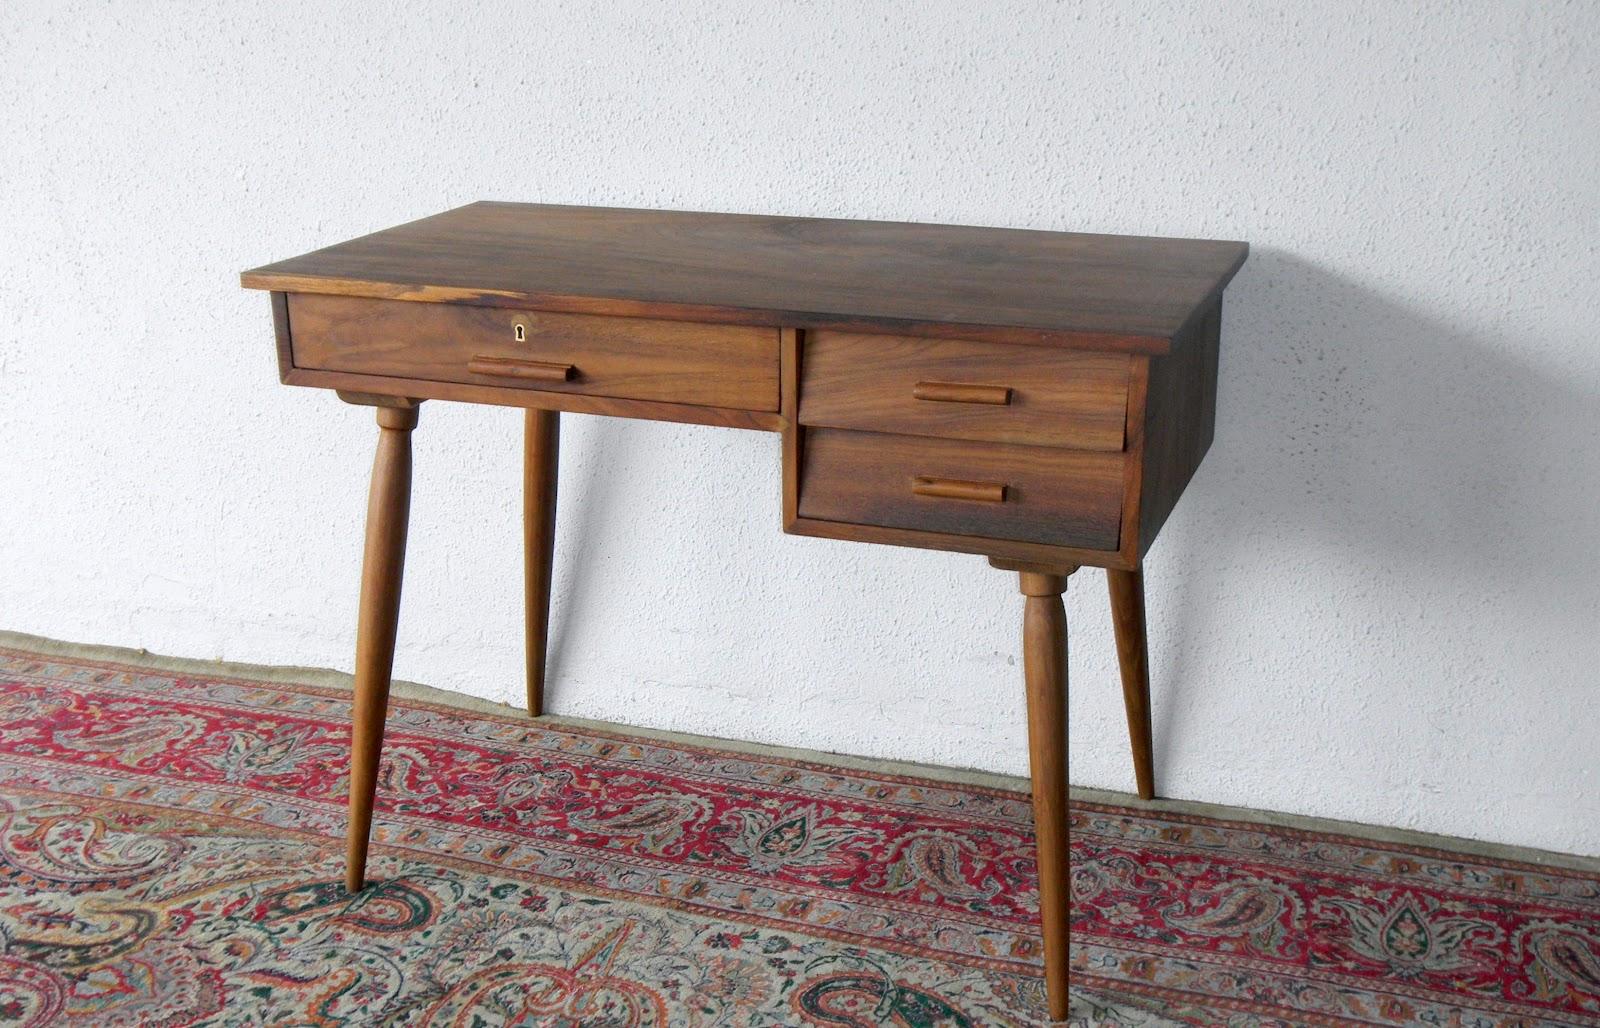 BUAT TESTING DOANG: Ashley Furniture Mid Century Modern